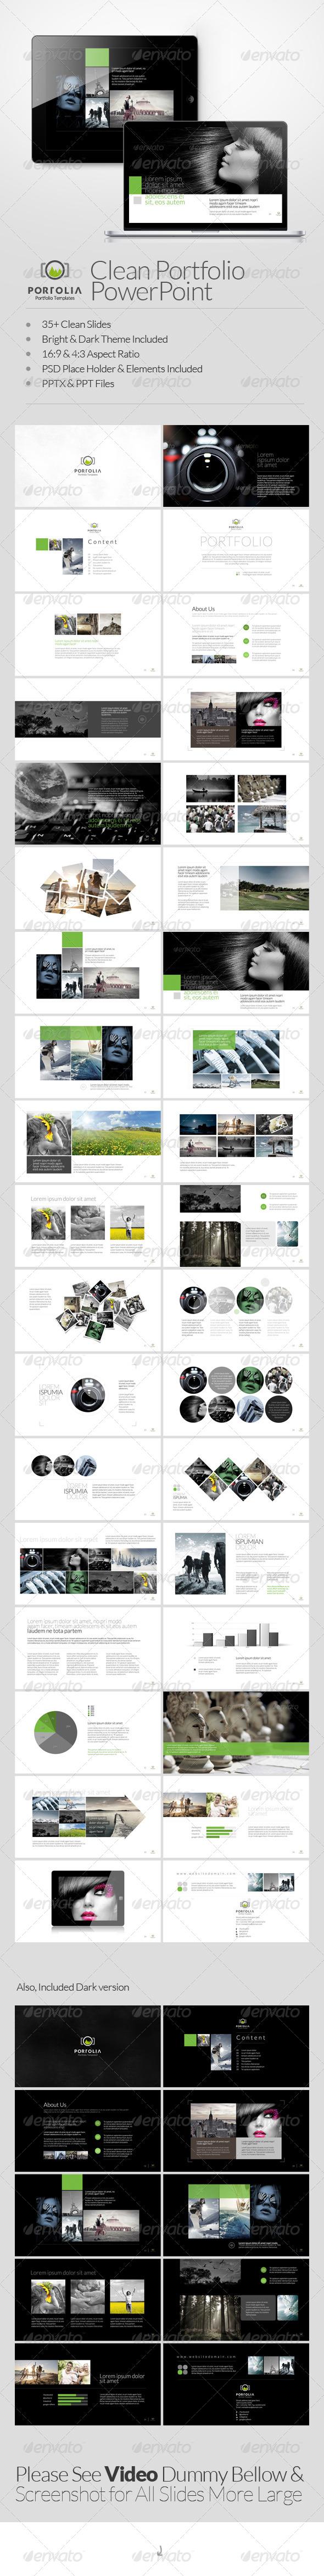 GraphicRiver Portolia Multipurpose Clean Portfolio Powerpoint 6537310